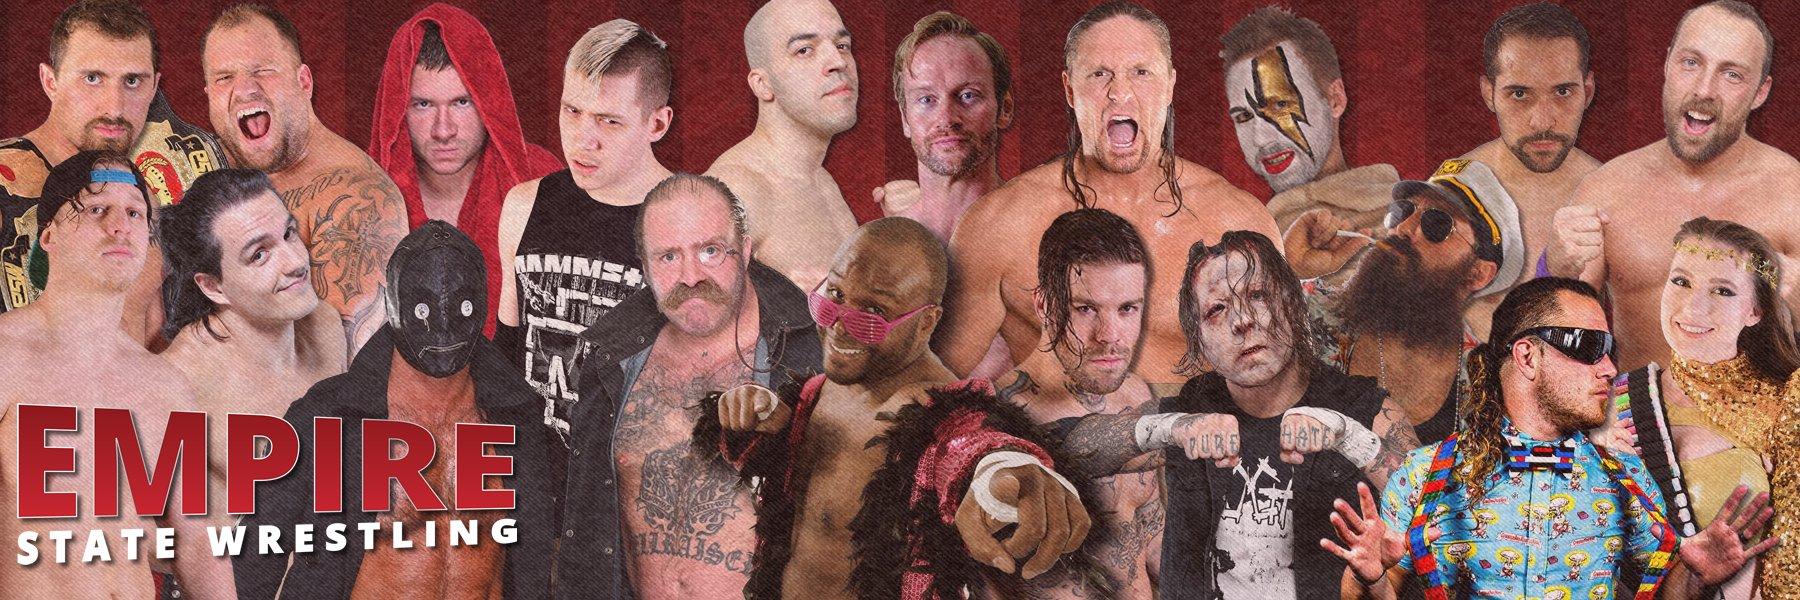 Empire State Wrestling - Western New York's Premier Professional Wrestling